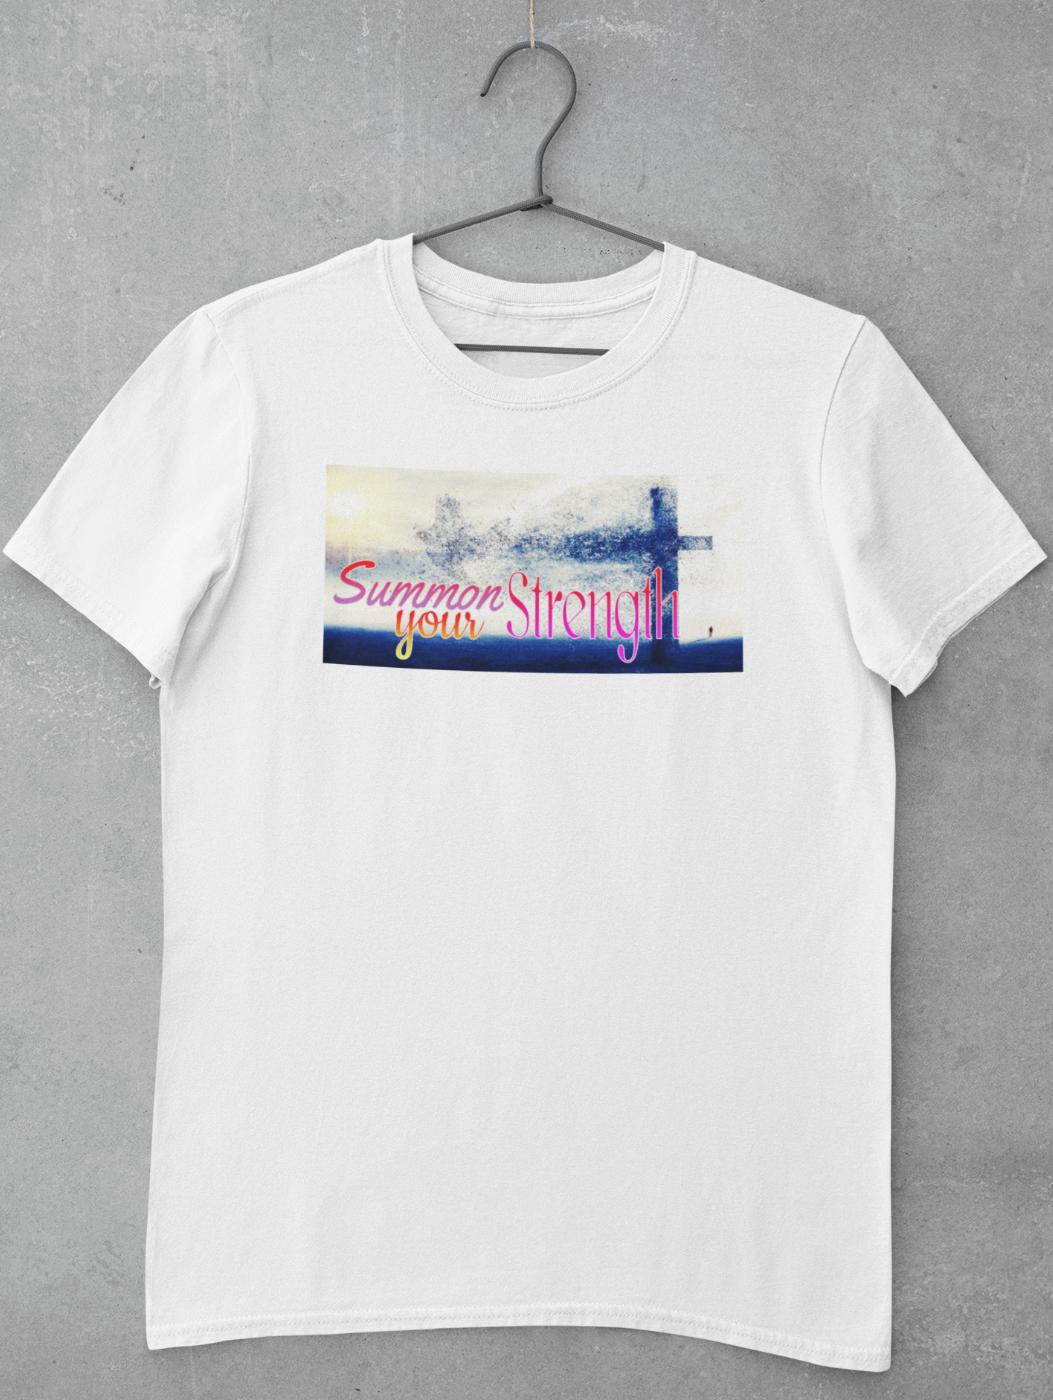 Summon Your Strength T-Shirt   Christian Apparel   Christian Shirt   Ships Free